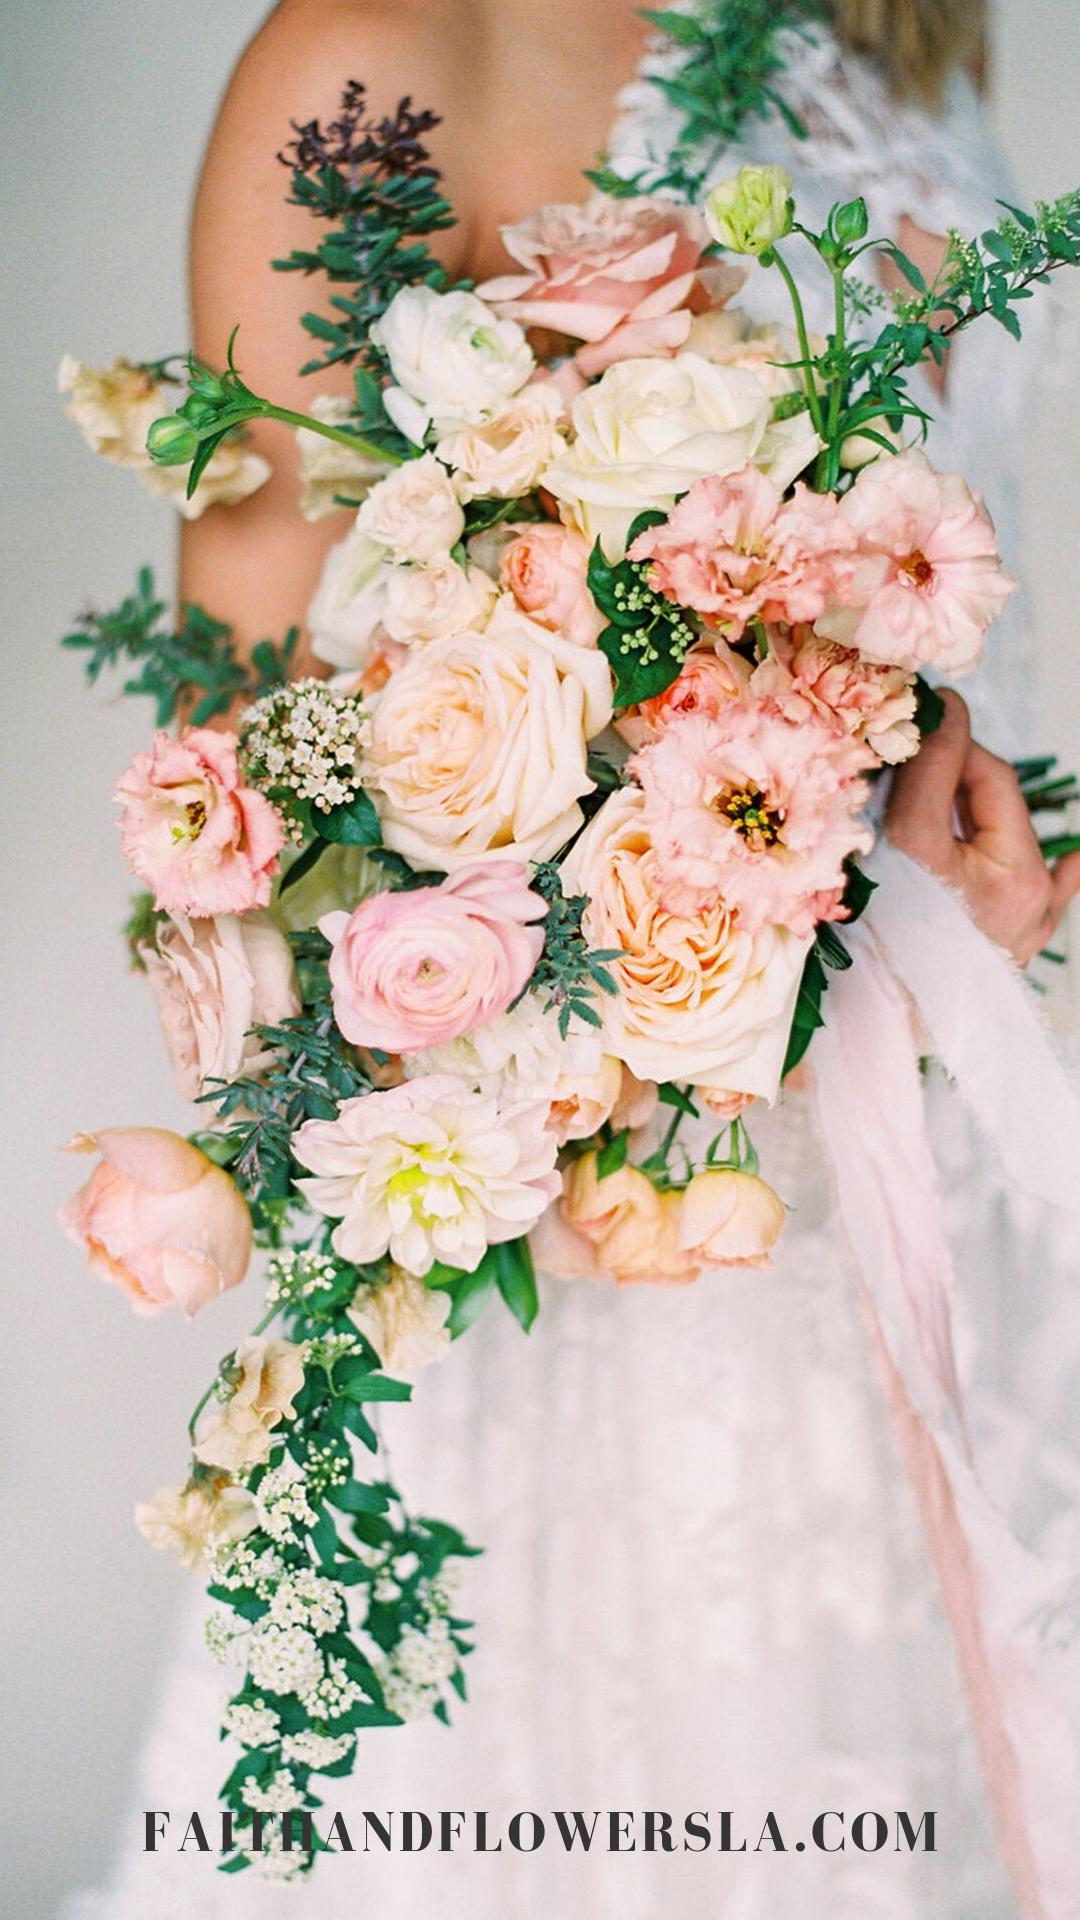 Faith And Flowers Lafayette Louisiana Wedding Florist Flower Centerpieces Wedding Summer Wedding Flowers Centerpieces Floral Wedding